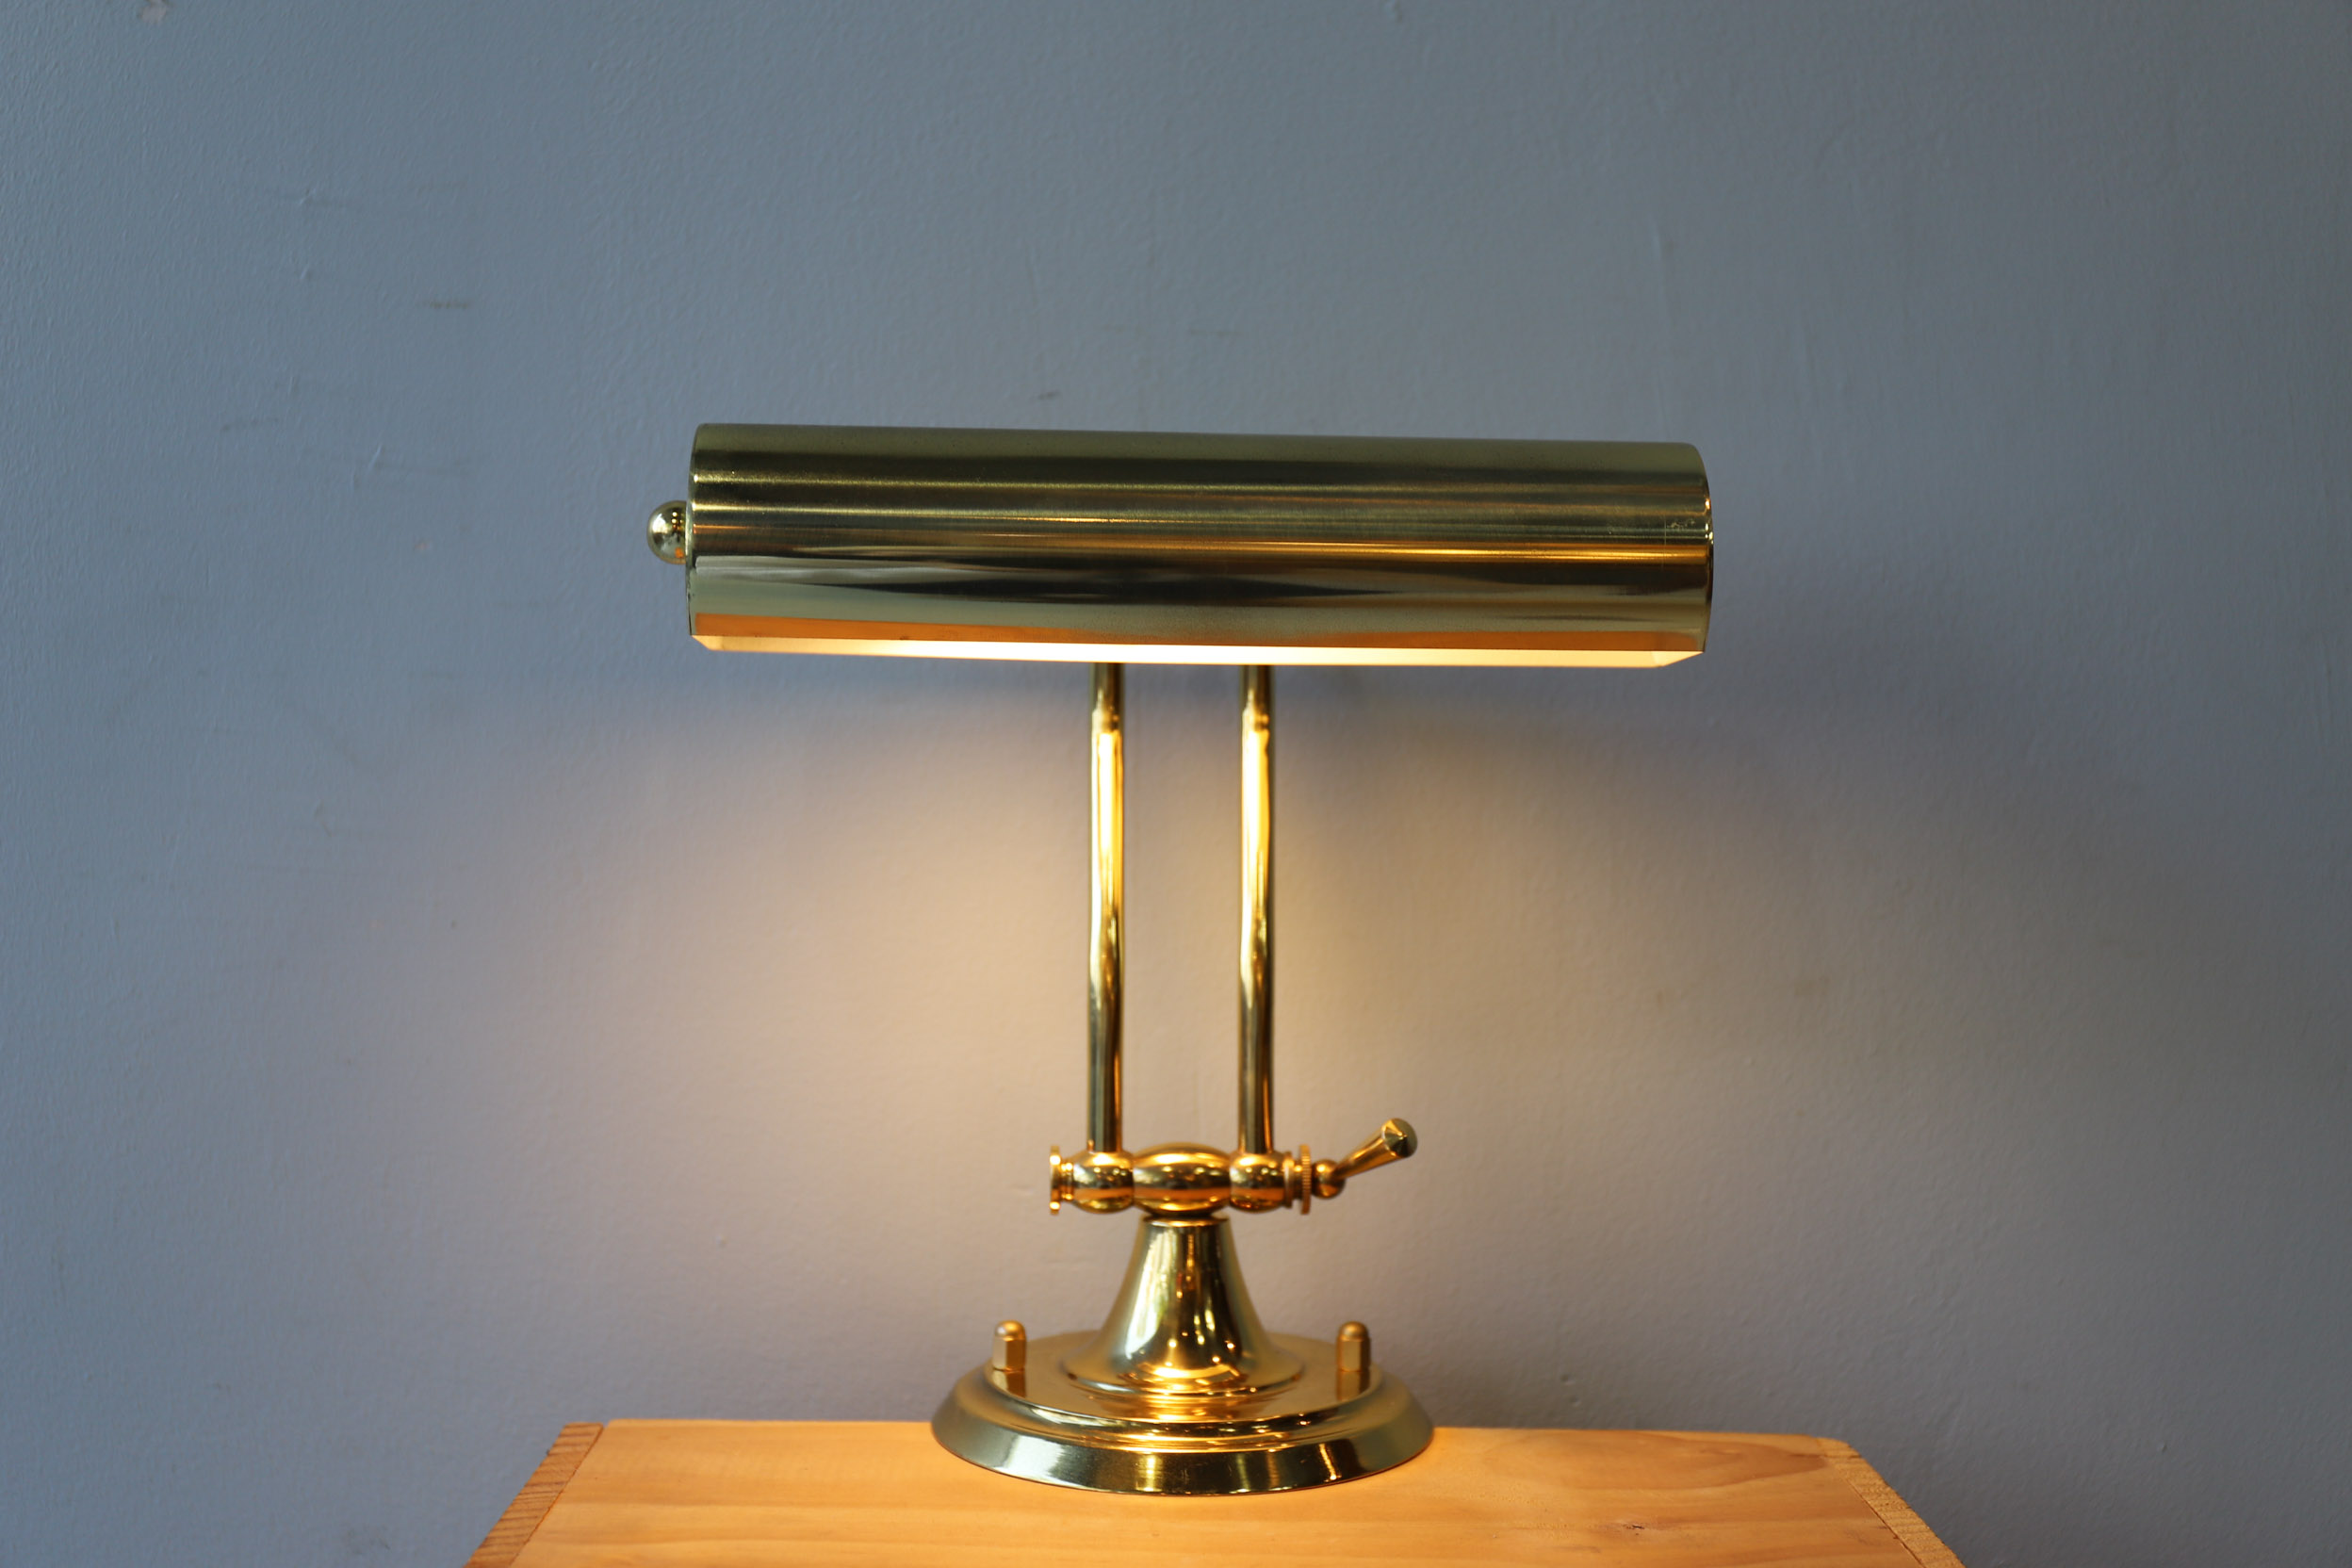 ENDO Brass Bracket Light/真鍮 ブラケット ライト ウォール ランプ 壁掛け 照明 インテリア 遠藤照明 1